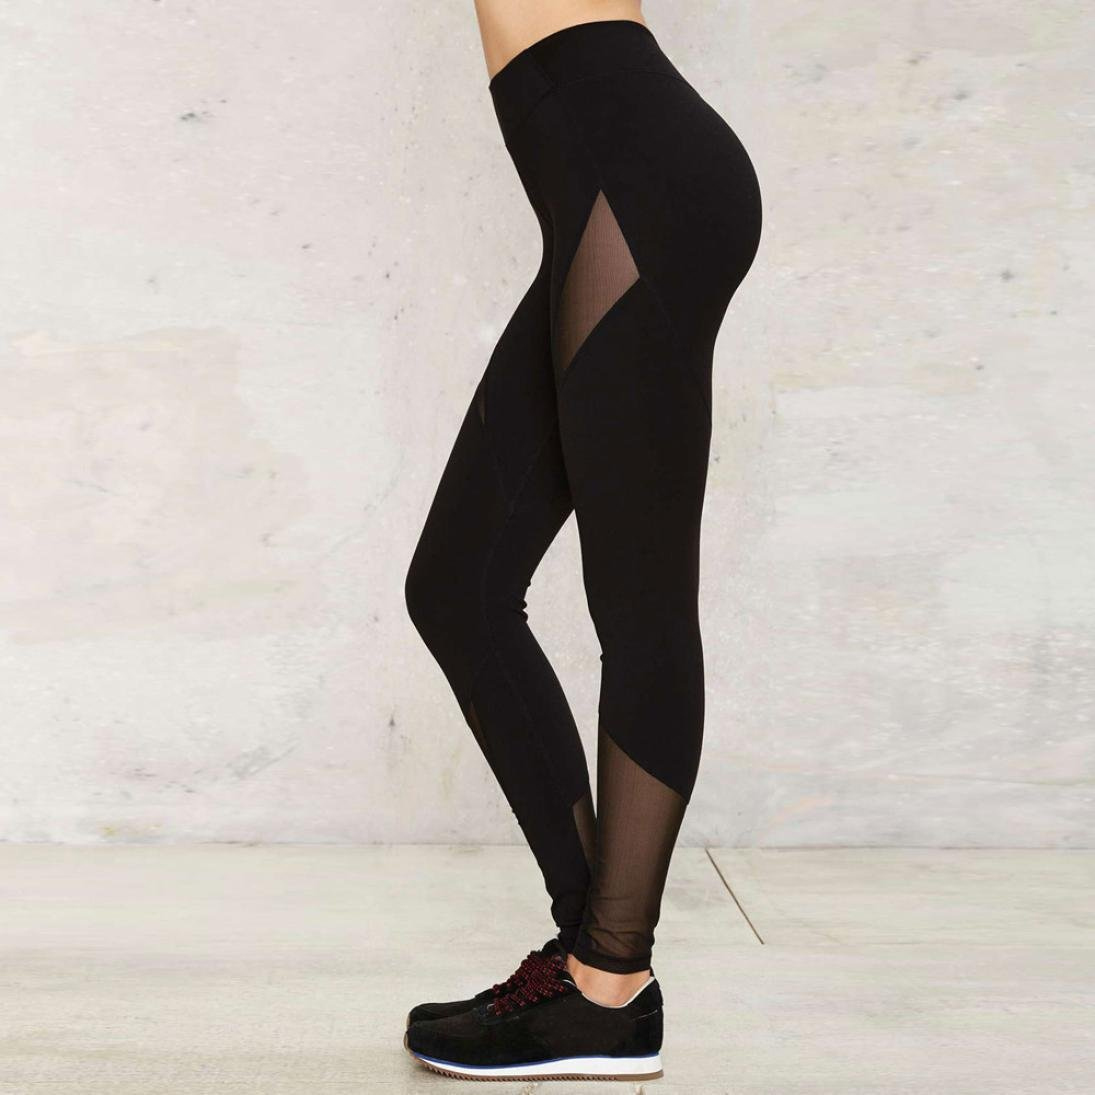 39f738397c7061 ... Skinny Yoga Pants, Pocciol Casual Mesh Leggings Women Dry Fit Workout  Trousers PO-1